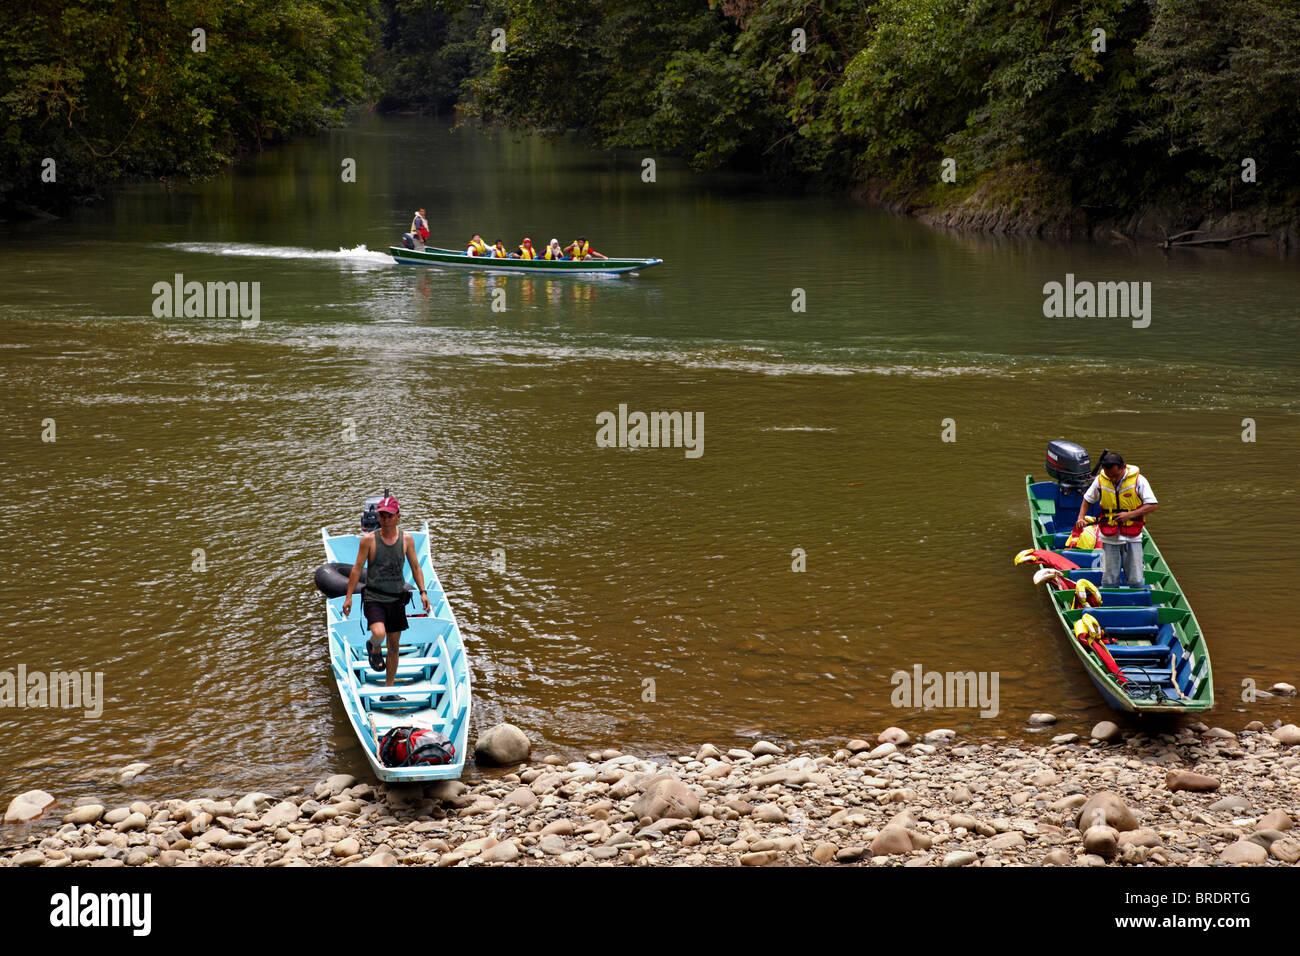 Sungai River, Ulu Temburong National Park, Brunei - Stock Image